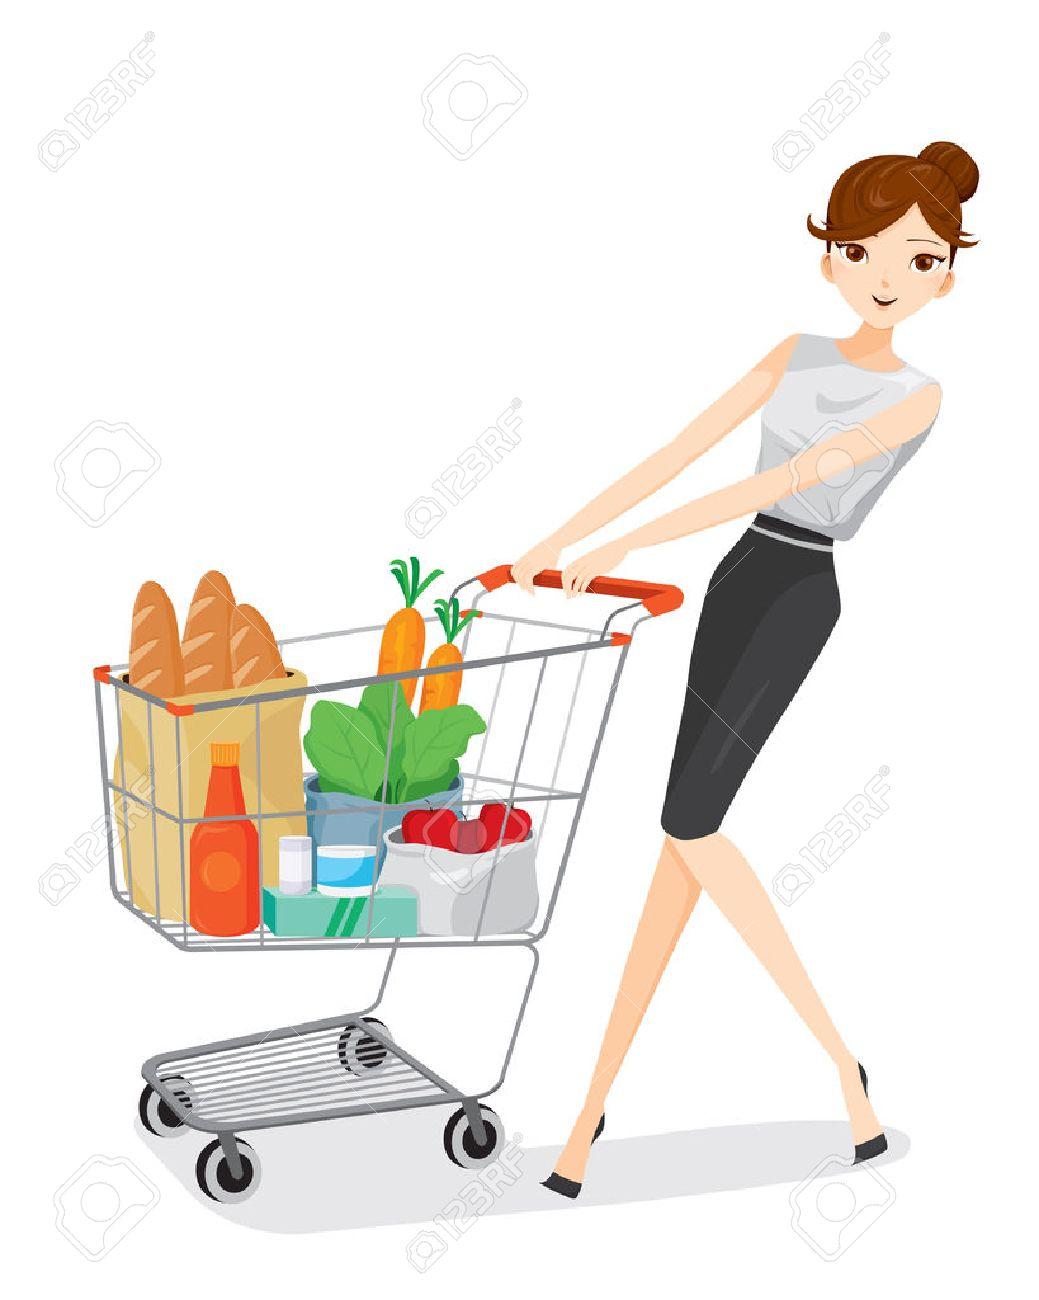 Woman pushing shopping cart, goods, food, beverage, beauty, lifestyle Foto de archivo - 53424261